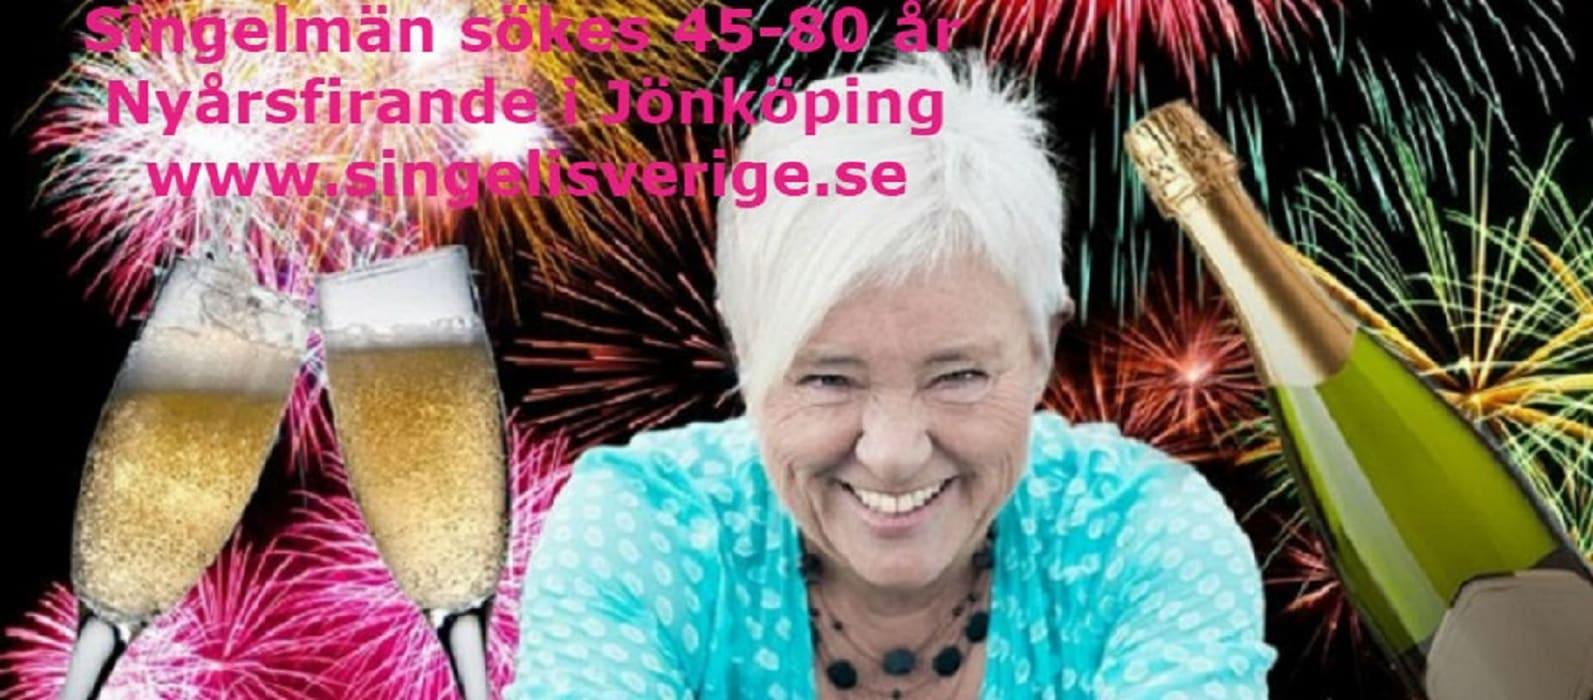 Lerbck Pornmovies Free Prostata Massage Stockholm Free Gay